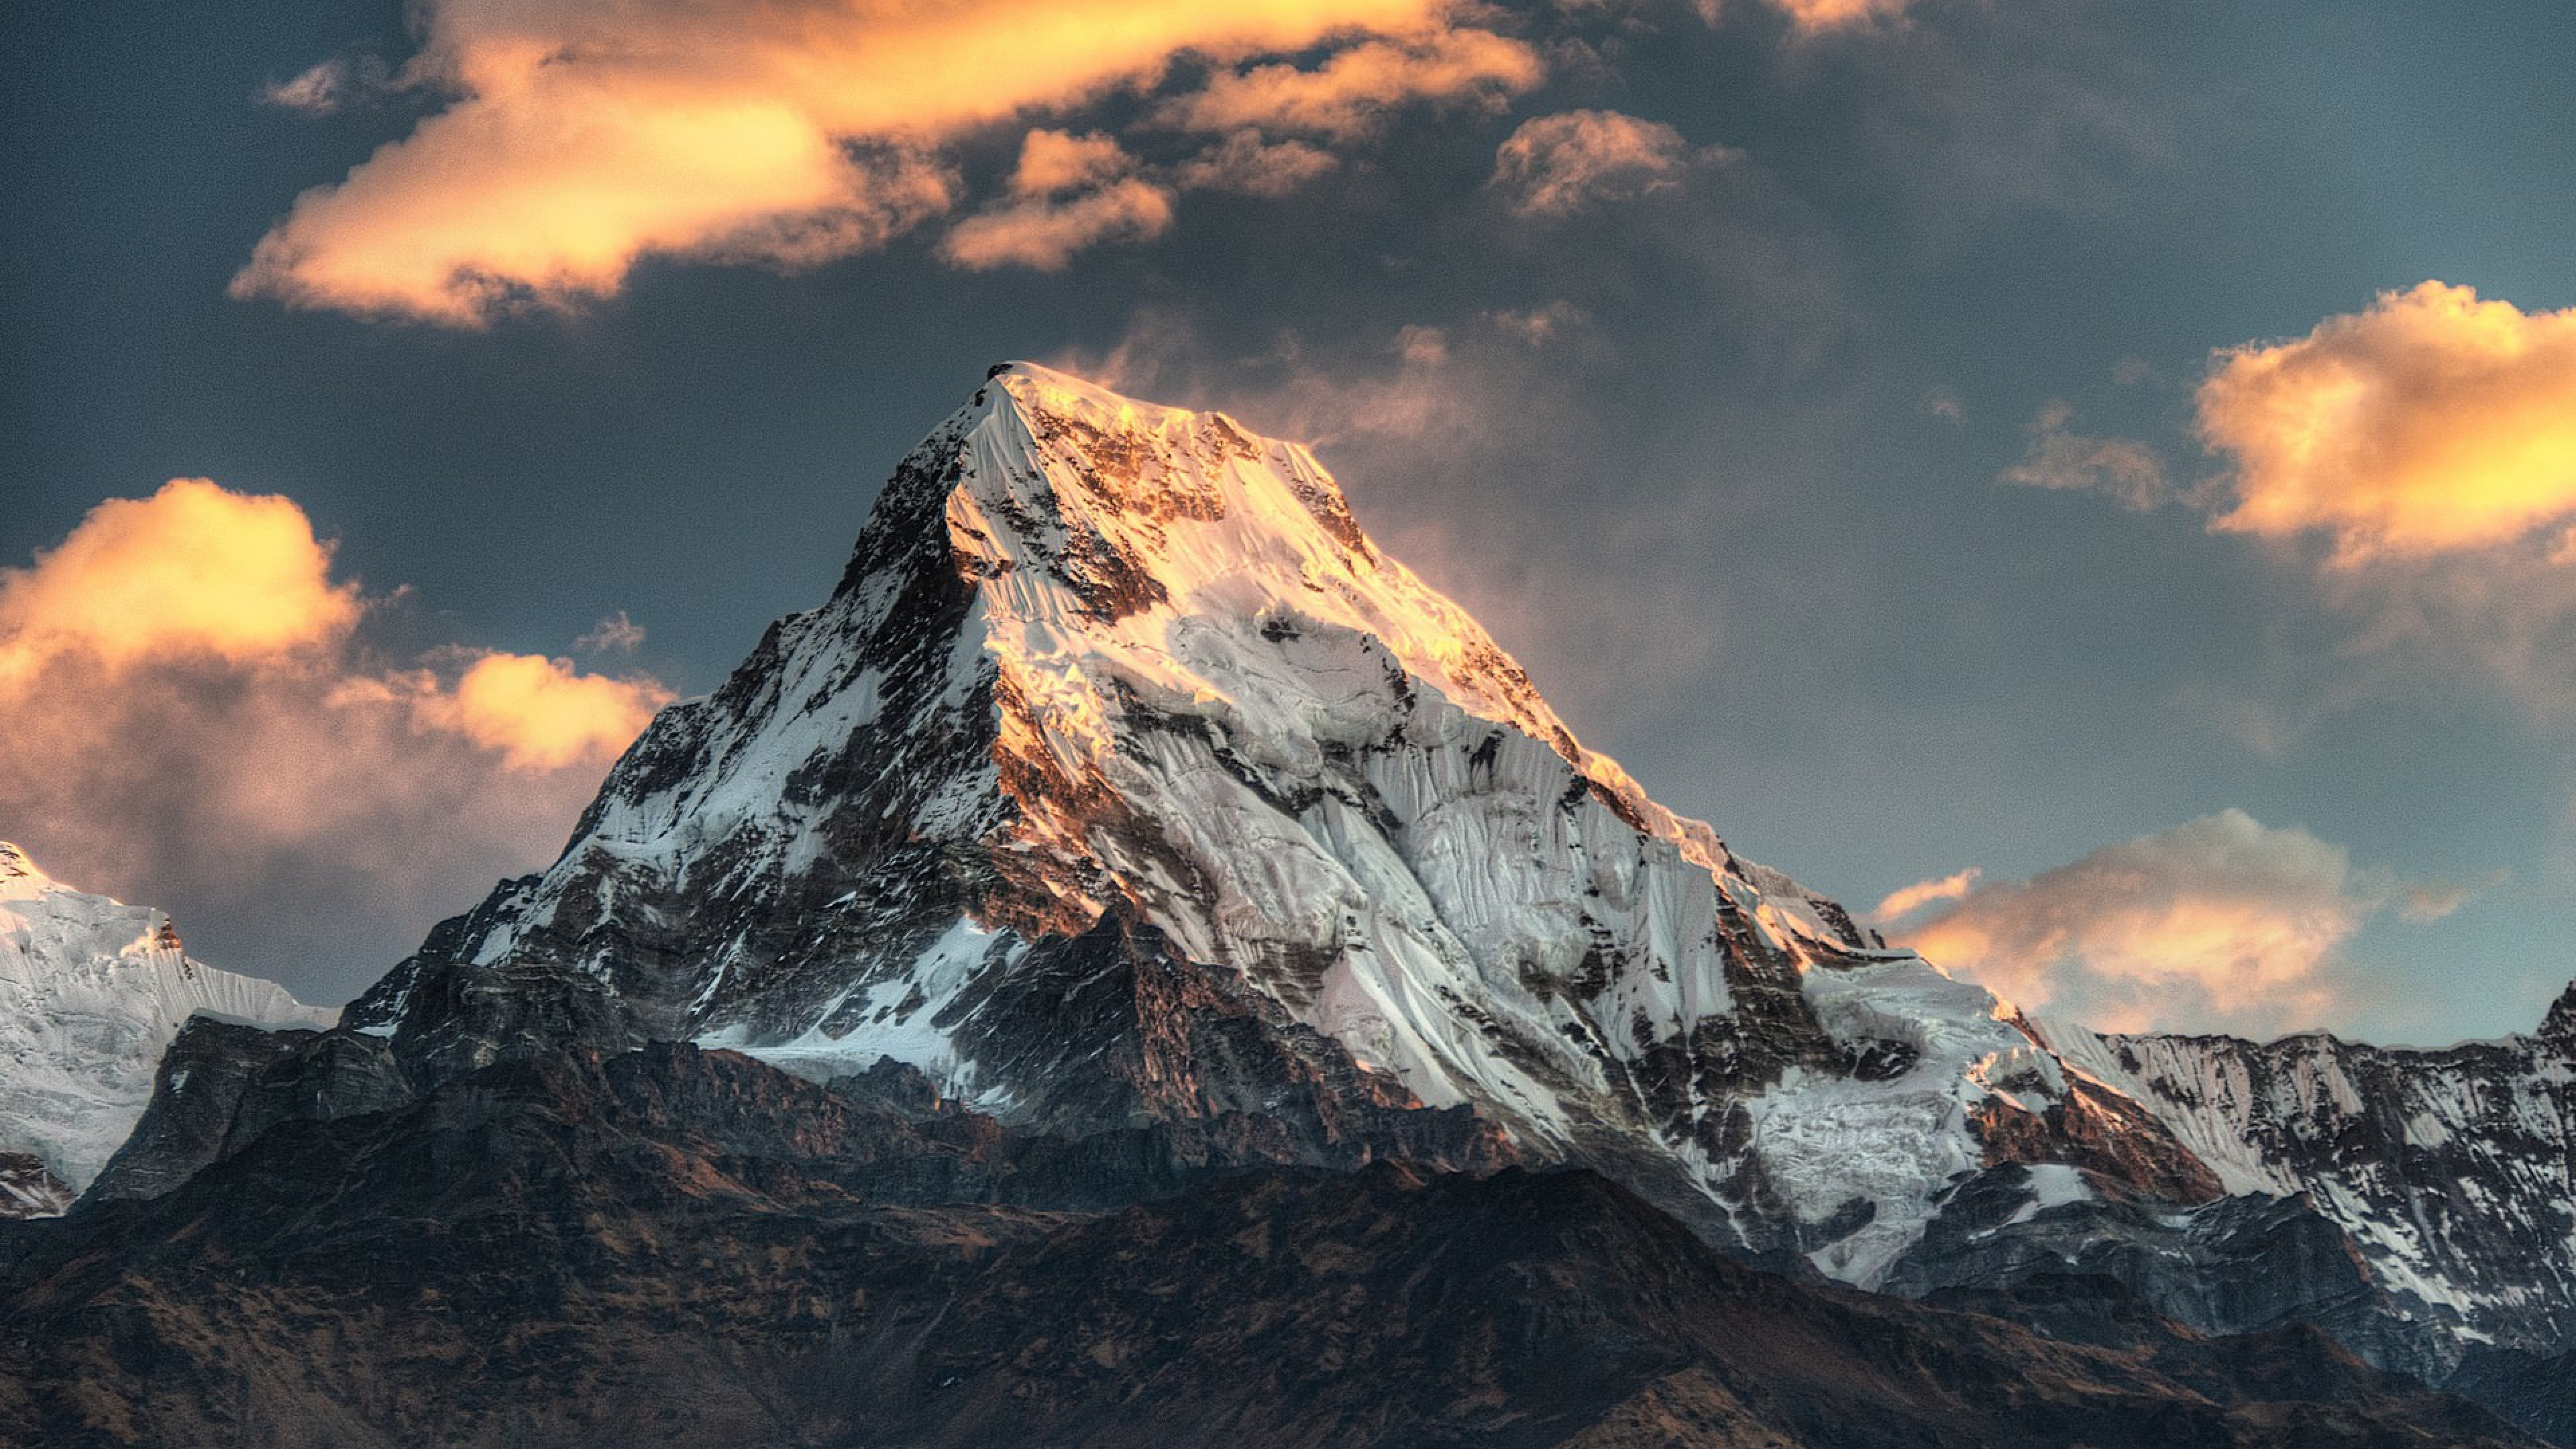 annapurna massif mountain range nepal 4k 1540142877 - Annapurna Massif Mountain Range Nepal 4k - world wallpapers, nepal wallpapers, nature wallpapers, mountains wallpapers, hd-wallpapers, 4k-wallpapers